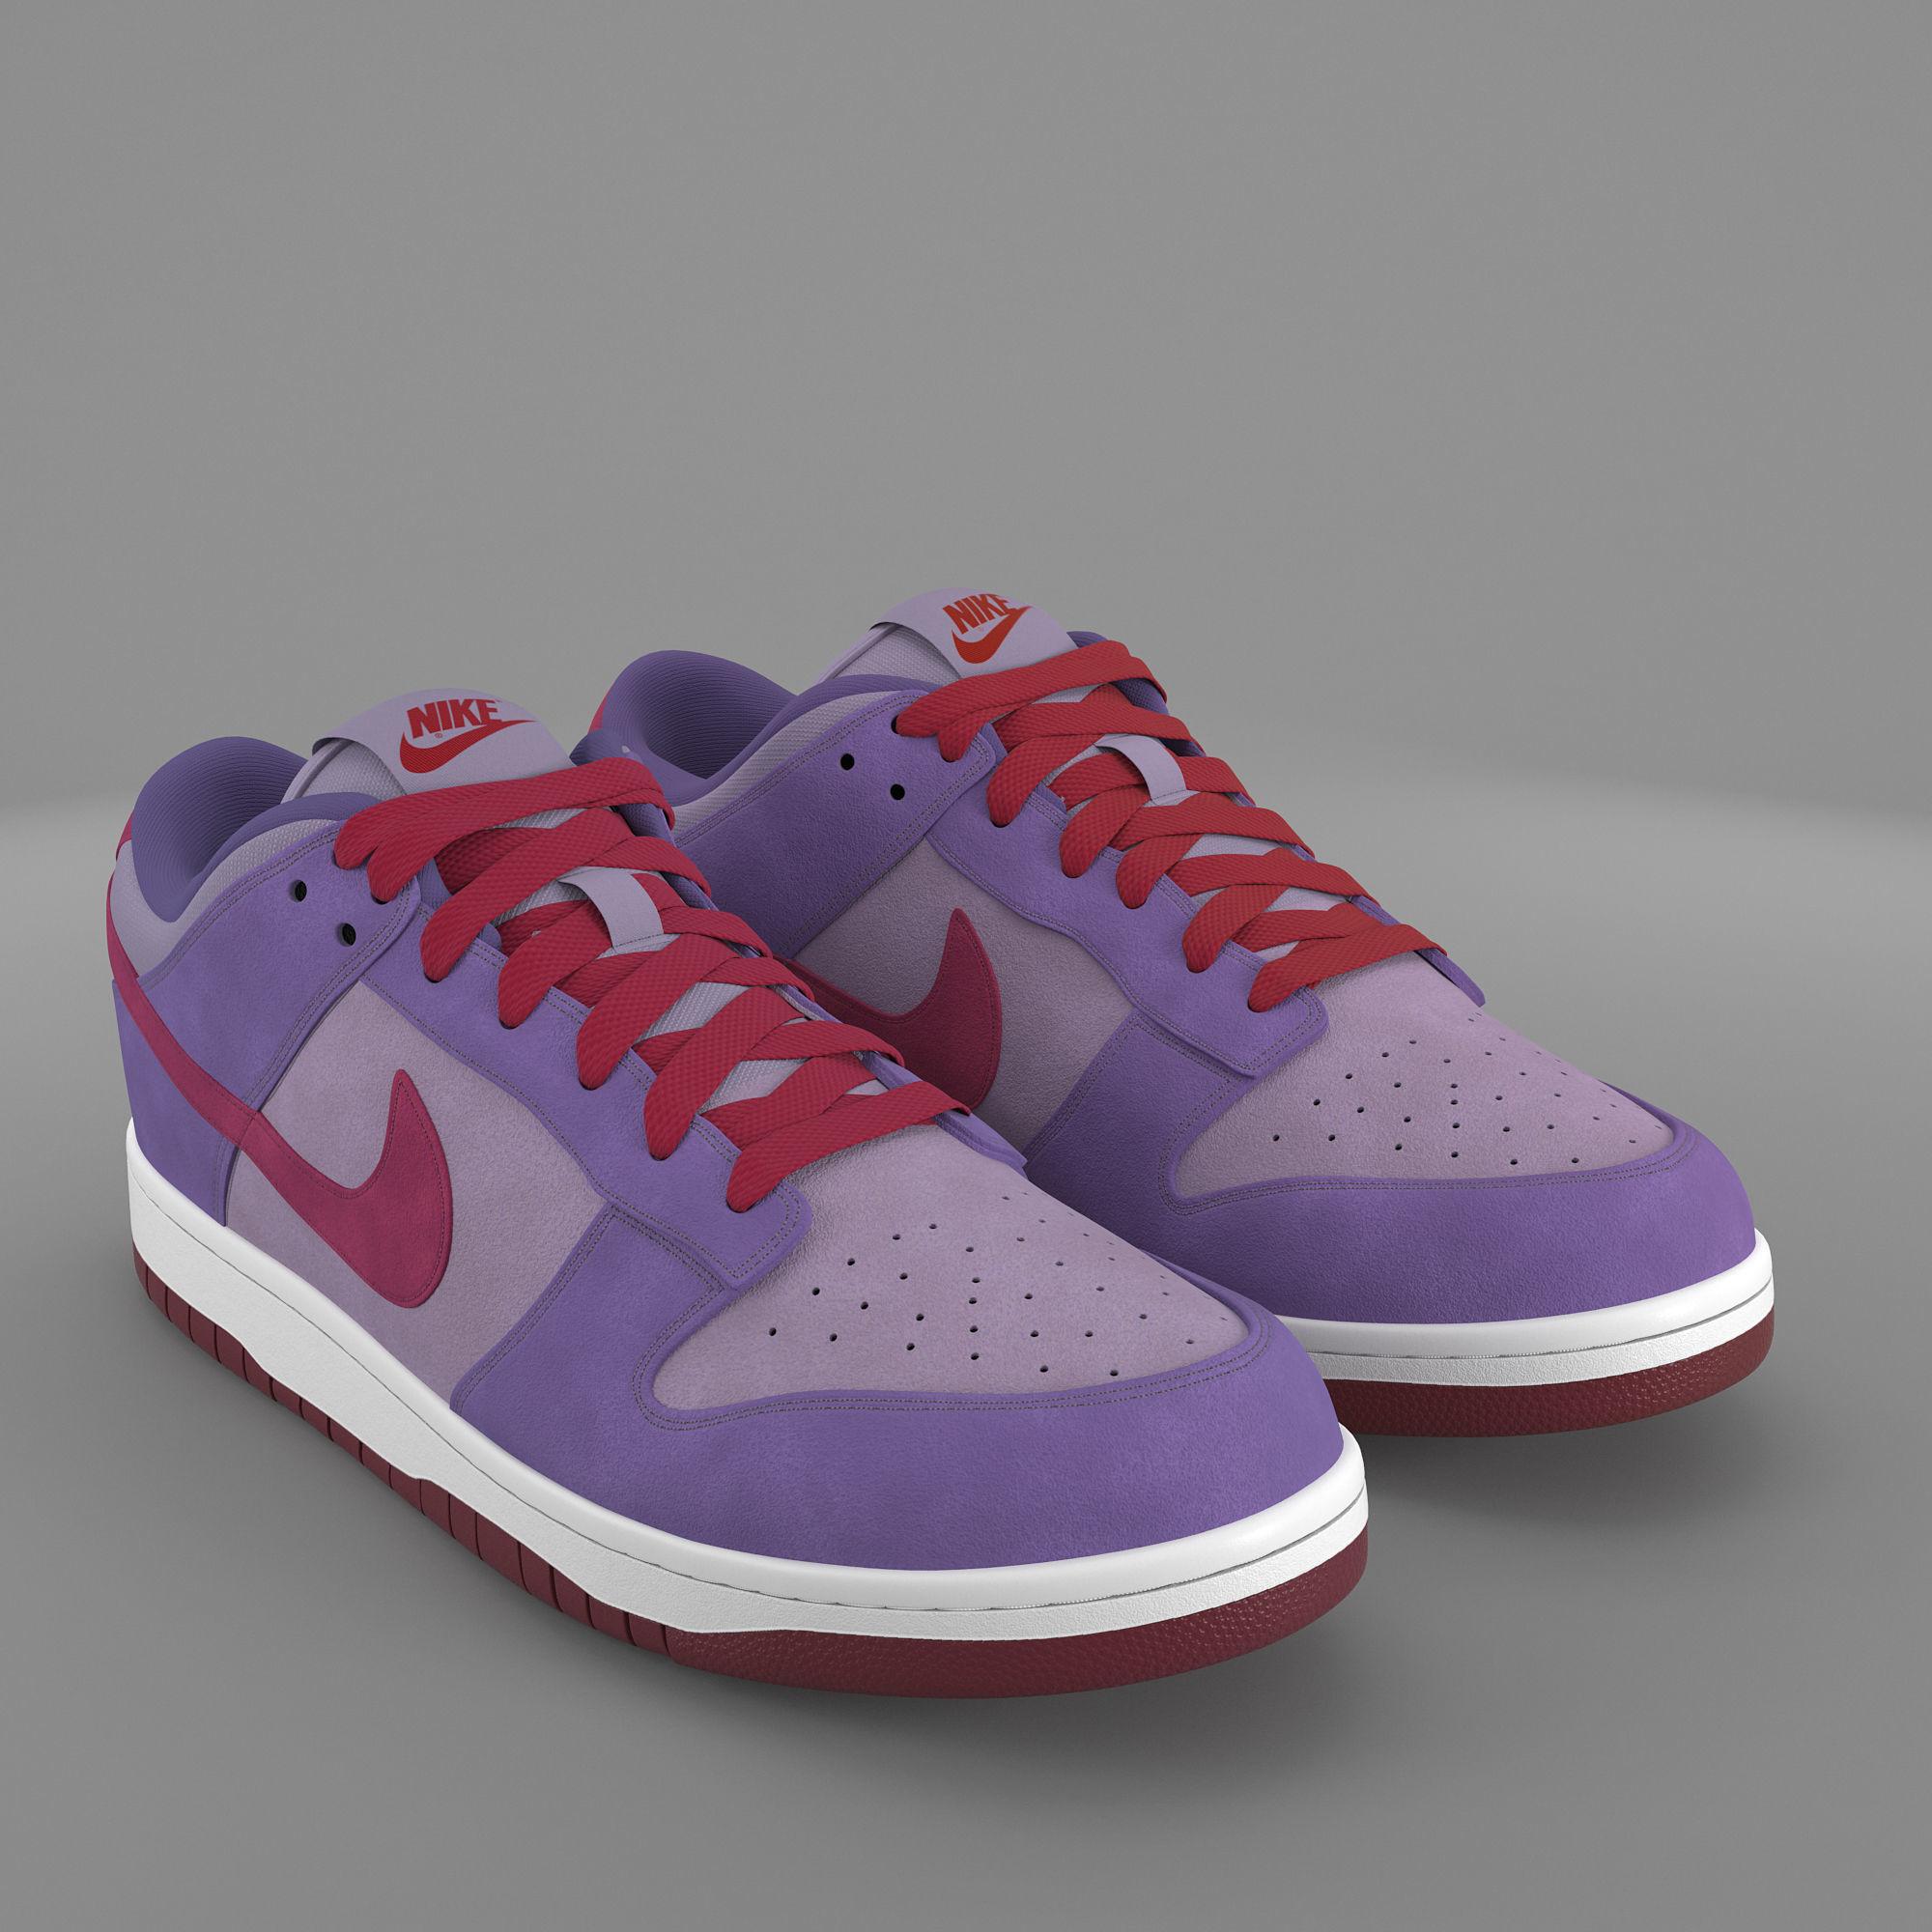 Nike Dunk Low Plum PBR